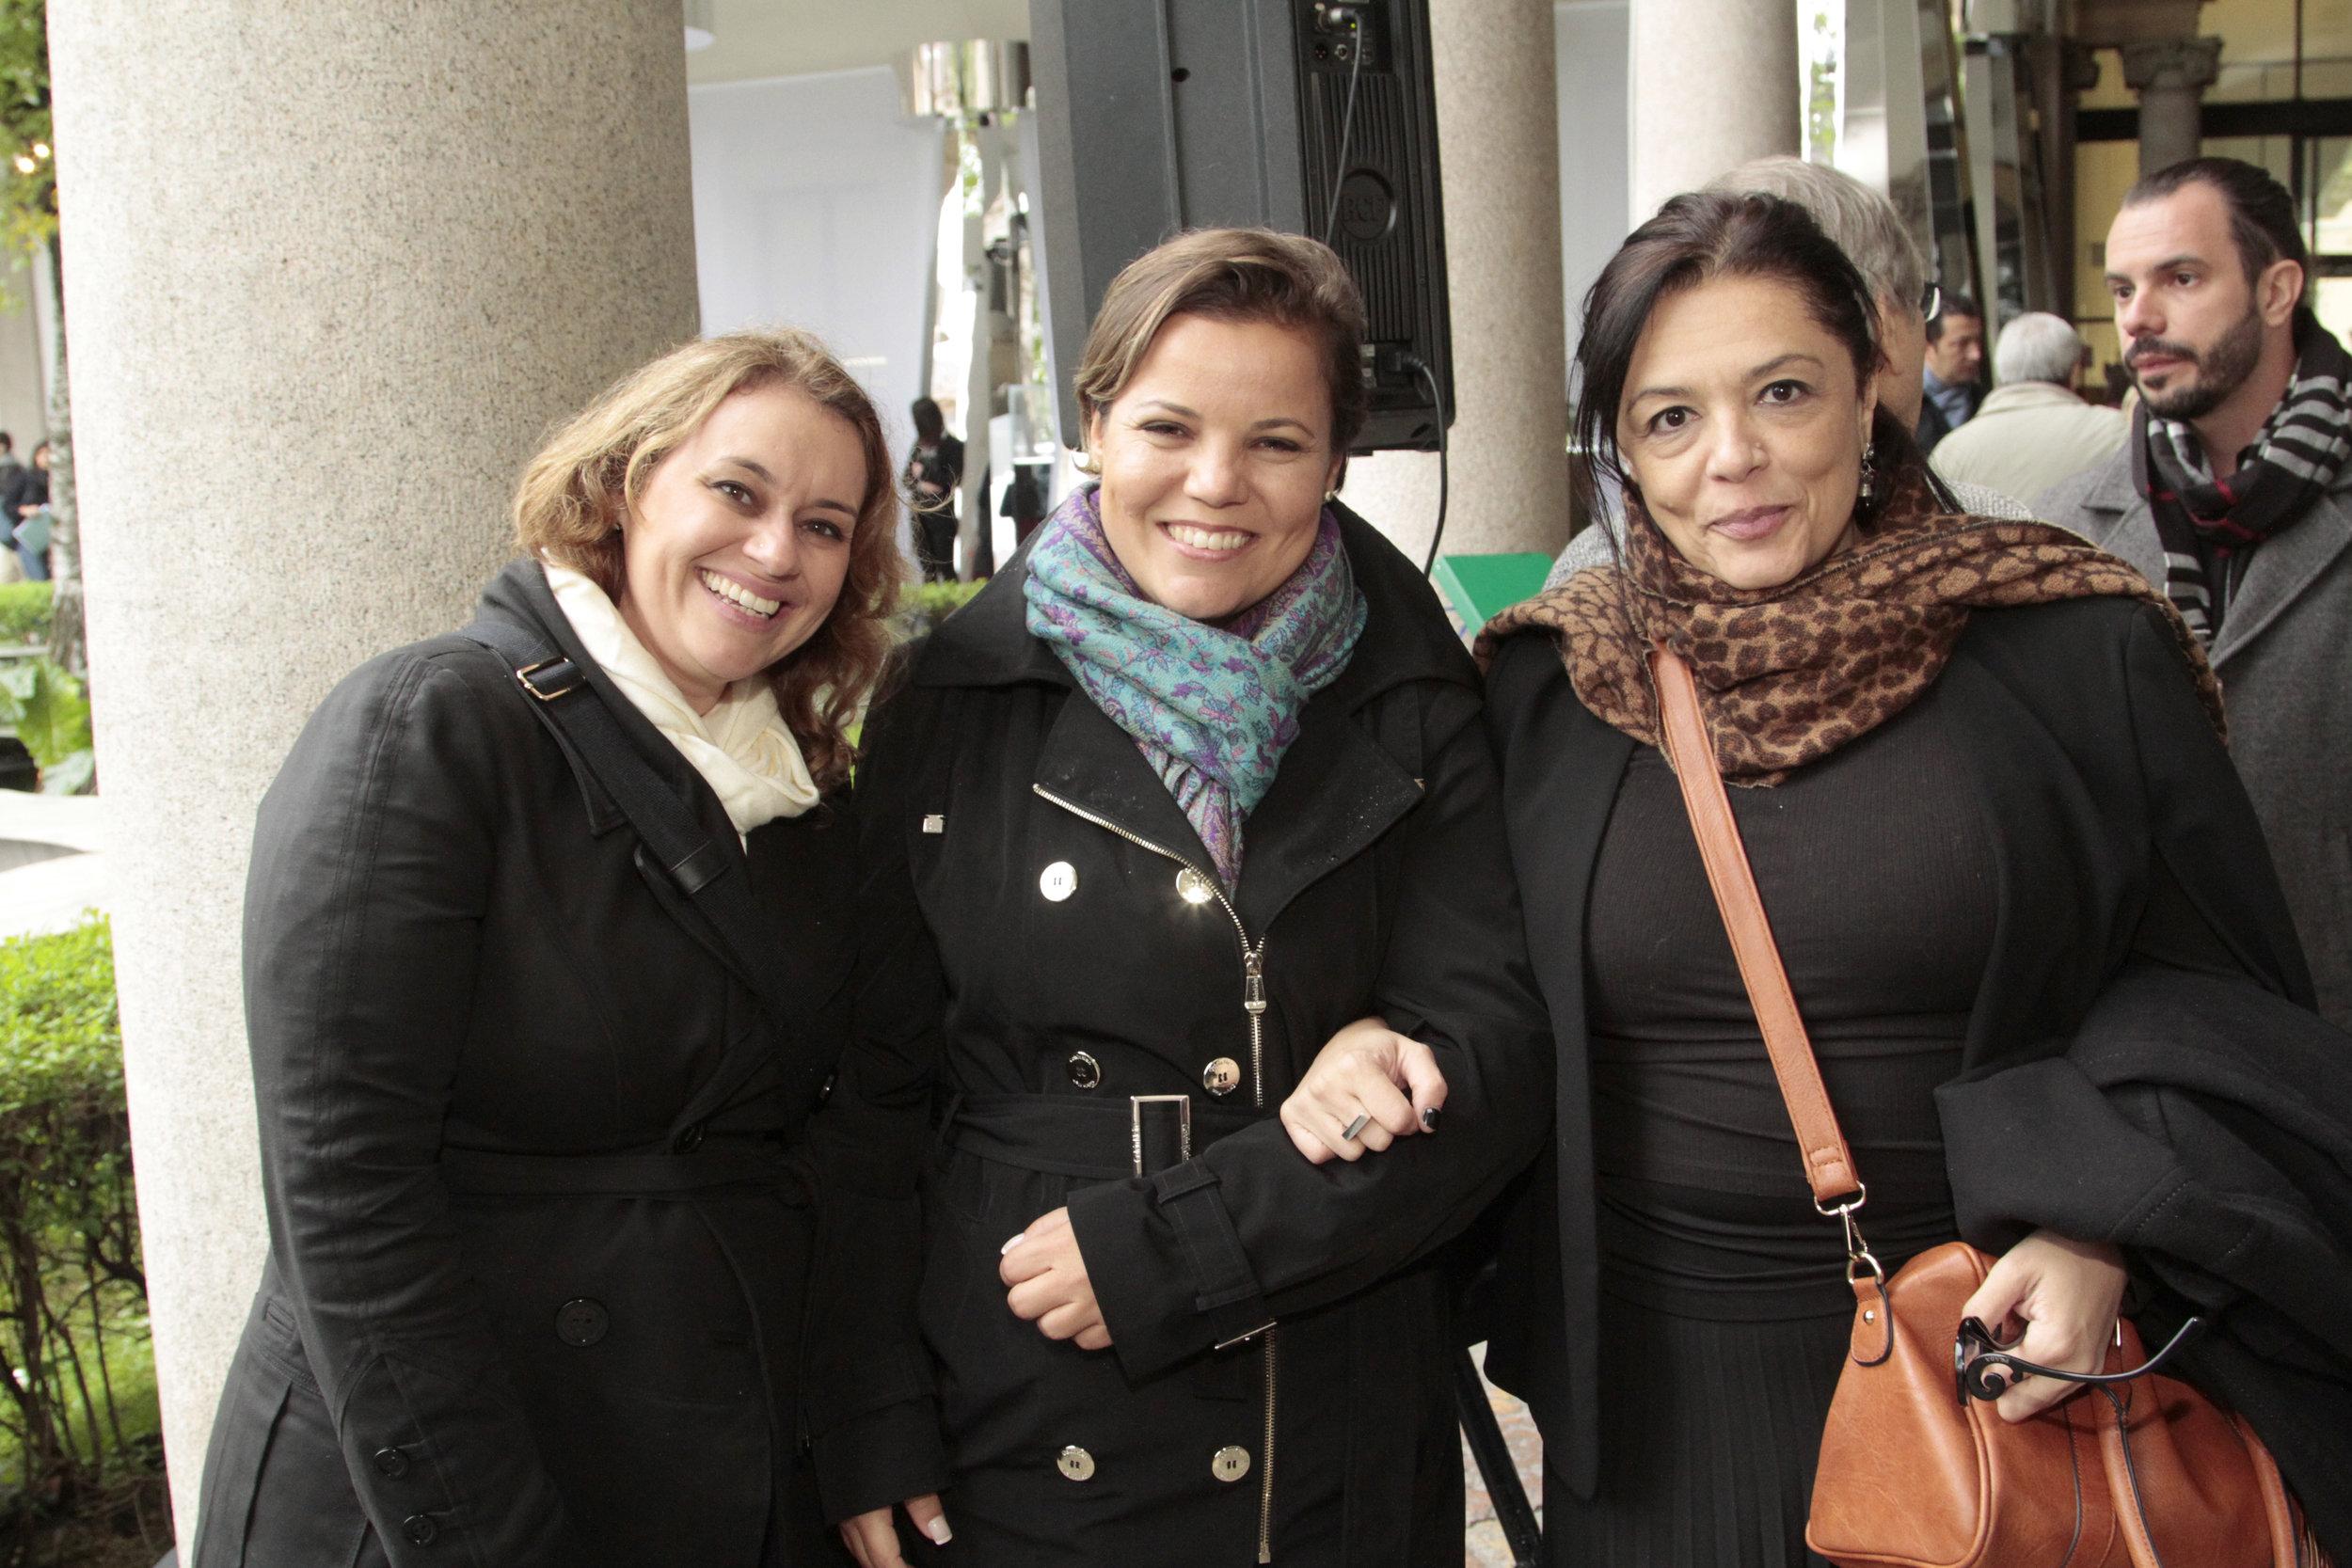 Flavia Maranhães, Priscila Boldrin e Andrea Falchi